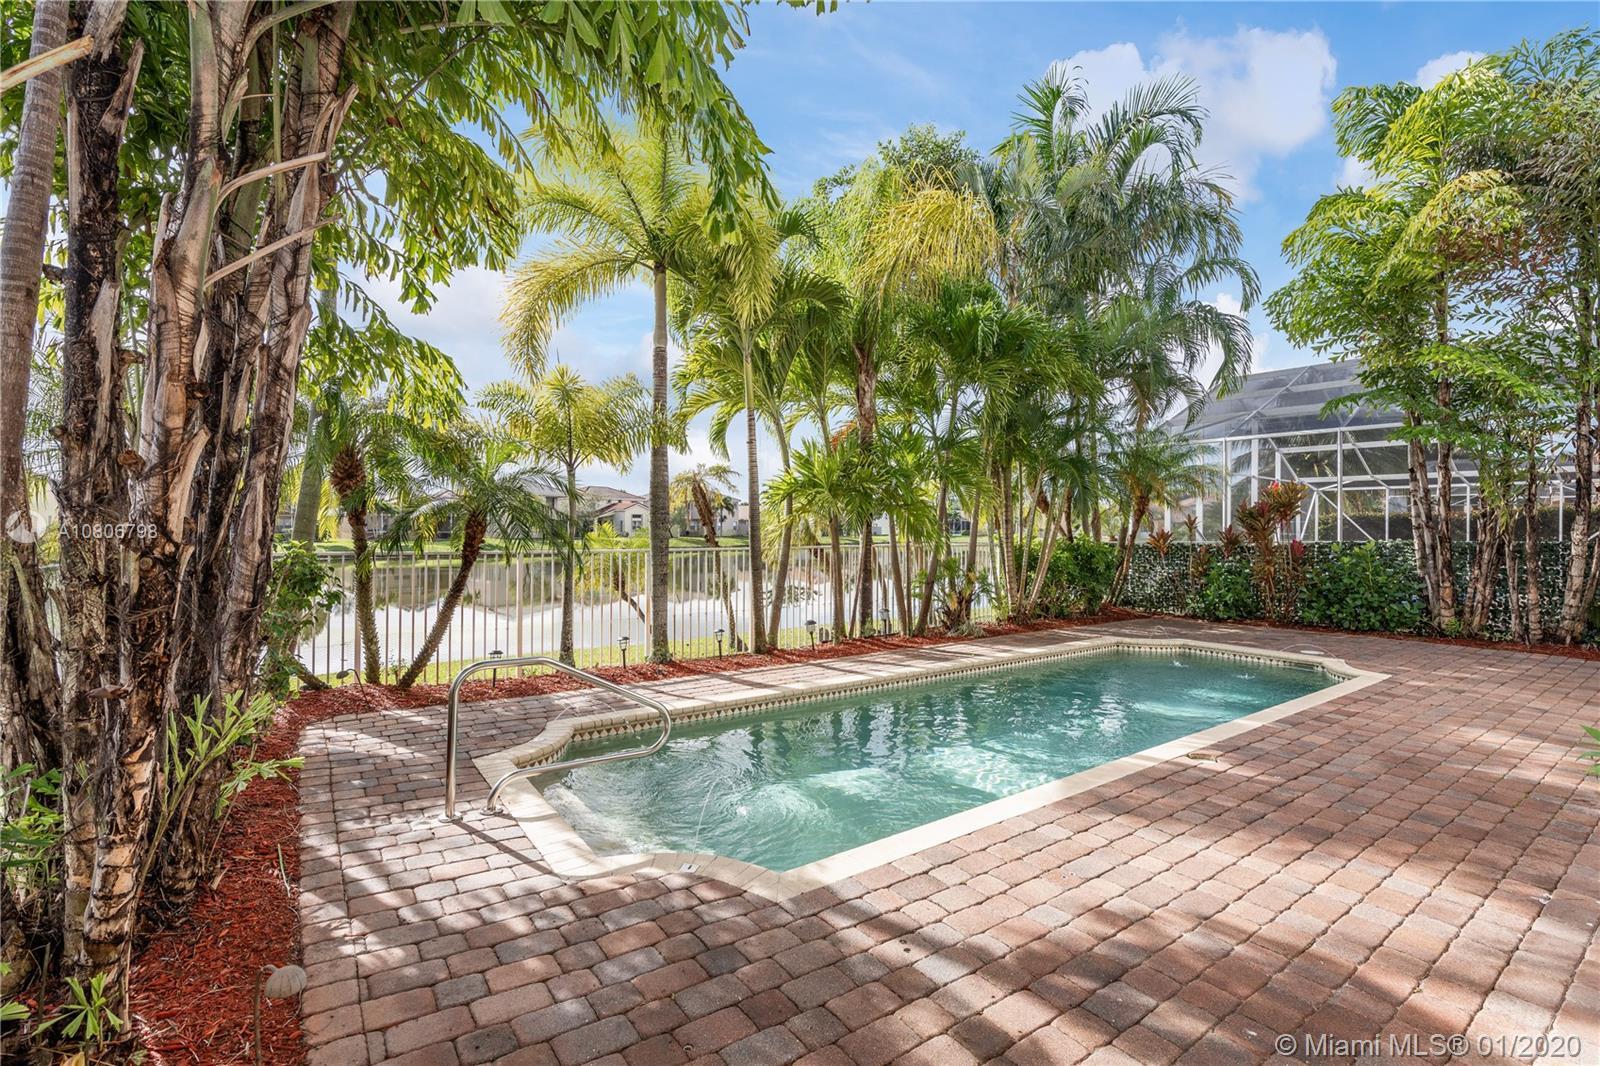 7108 Via Leonardo, Lake Worth, FL 33467 - Lake Worth, FL real estate listing